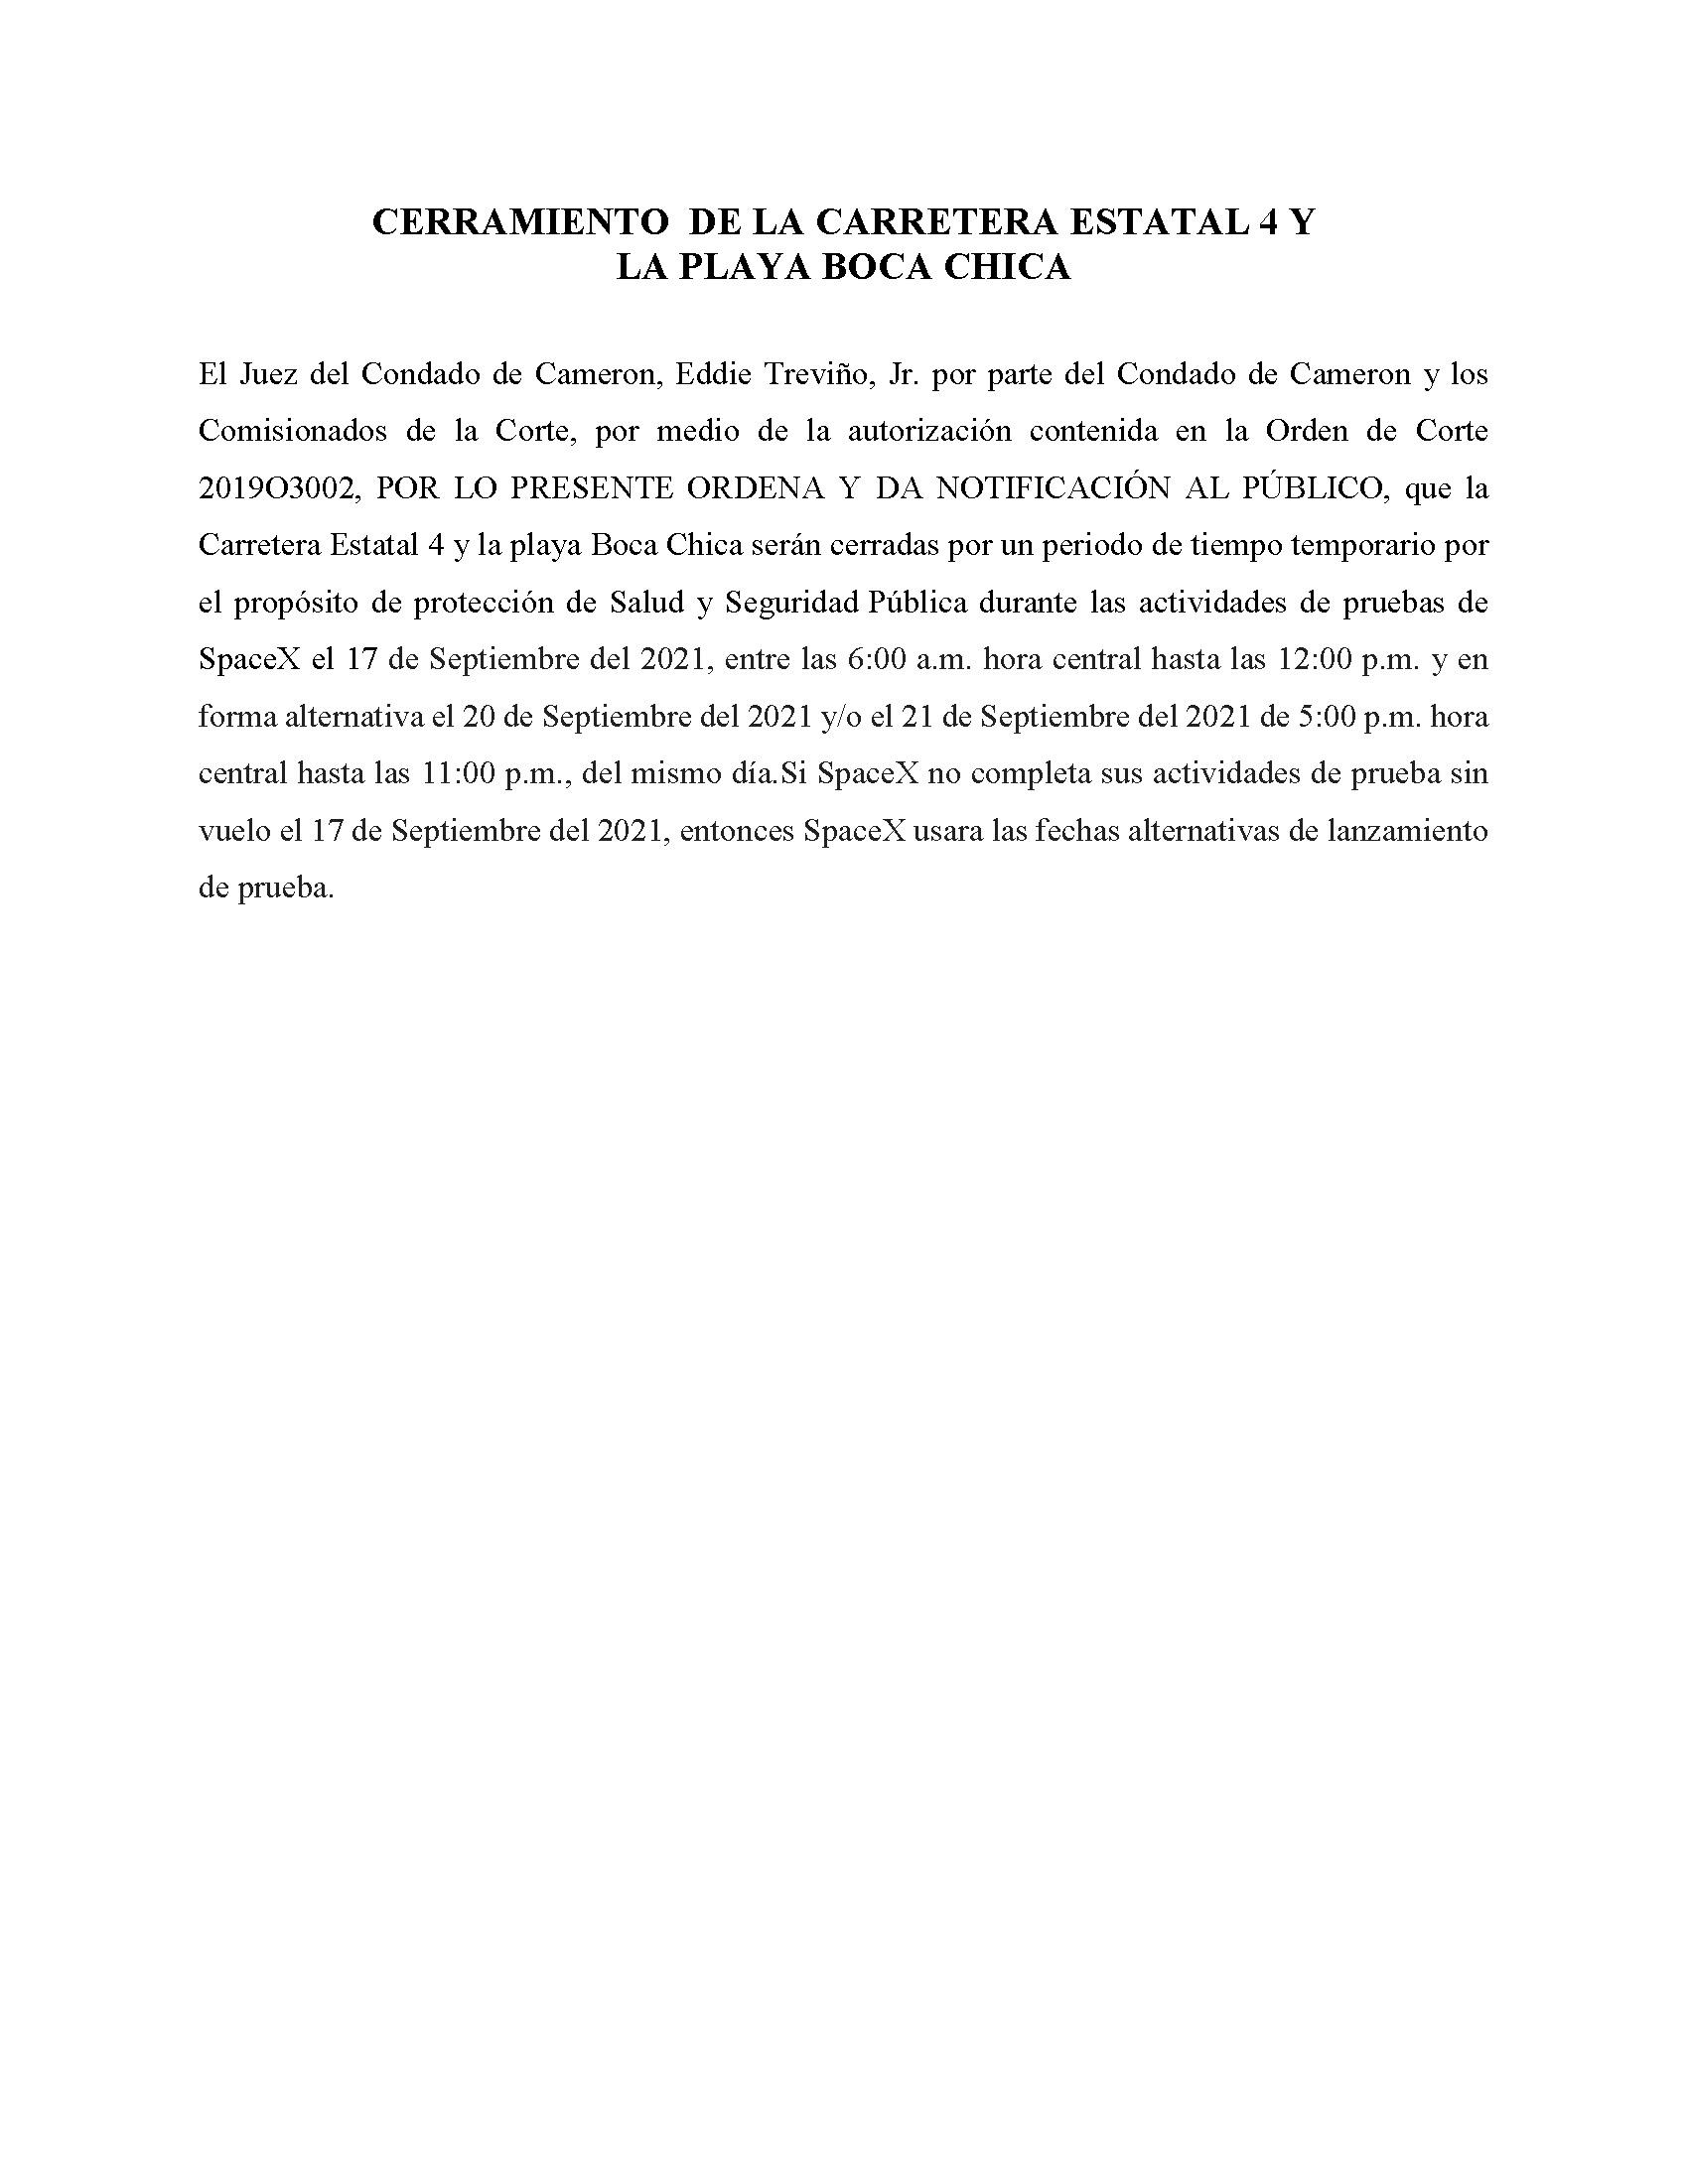 ORDER.CLOSURE OF HIGHWAY 4 Y LA PLAYA BOCA CHICA.SPANISH.09.17.2021